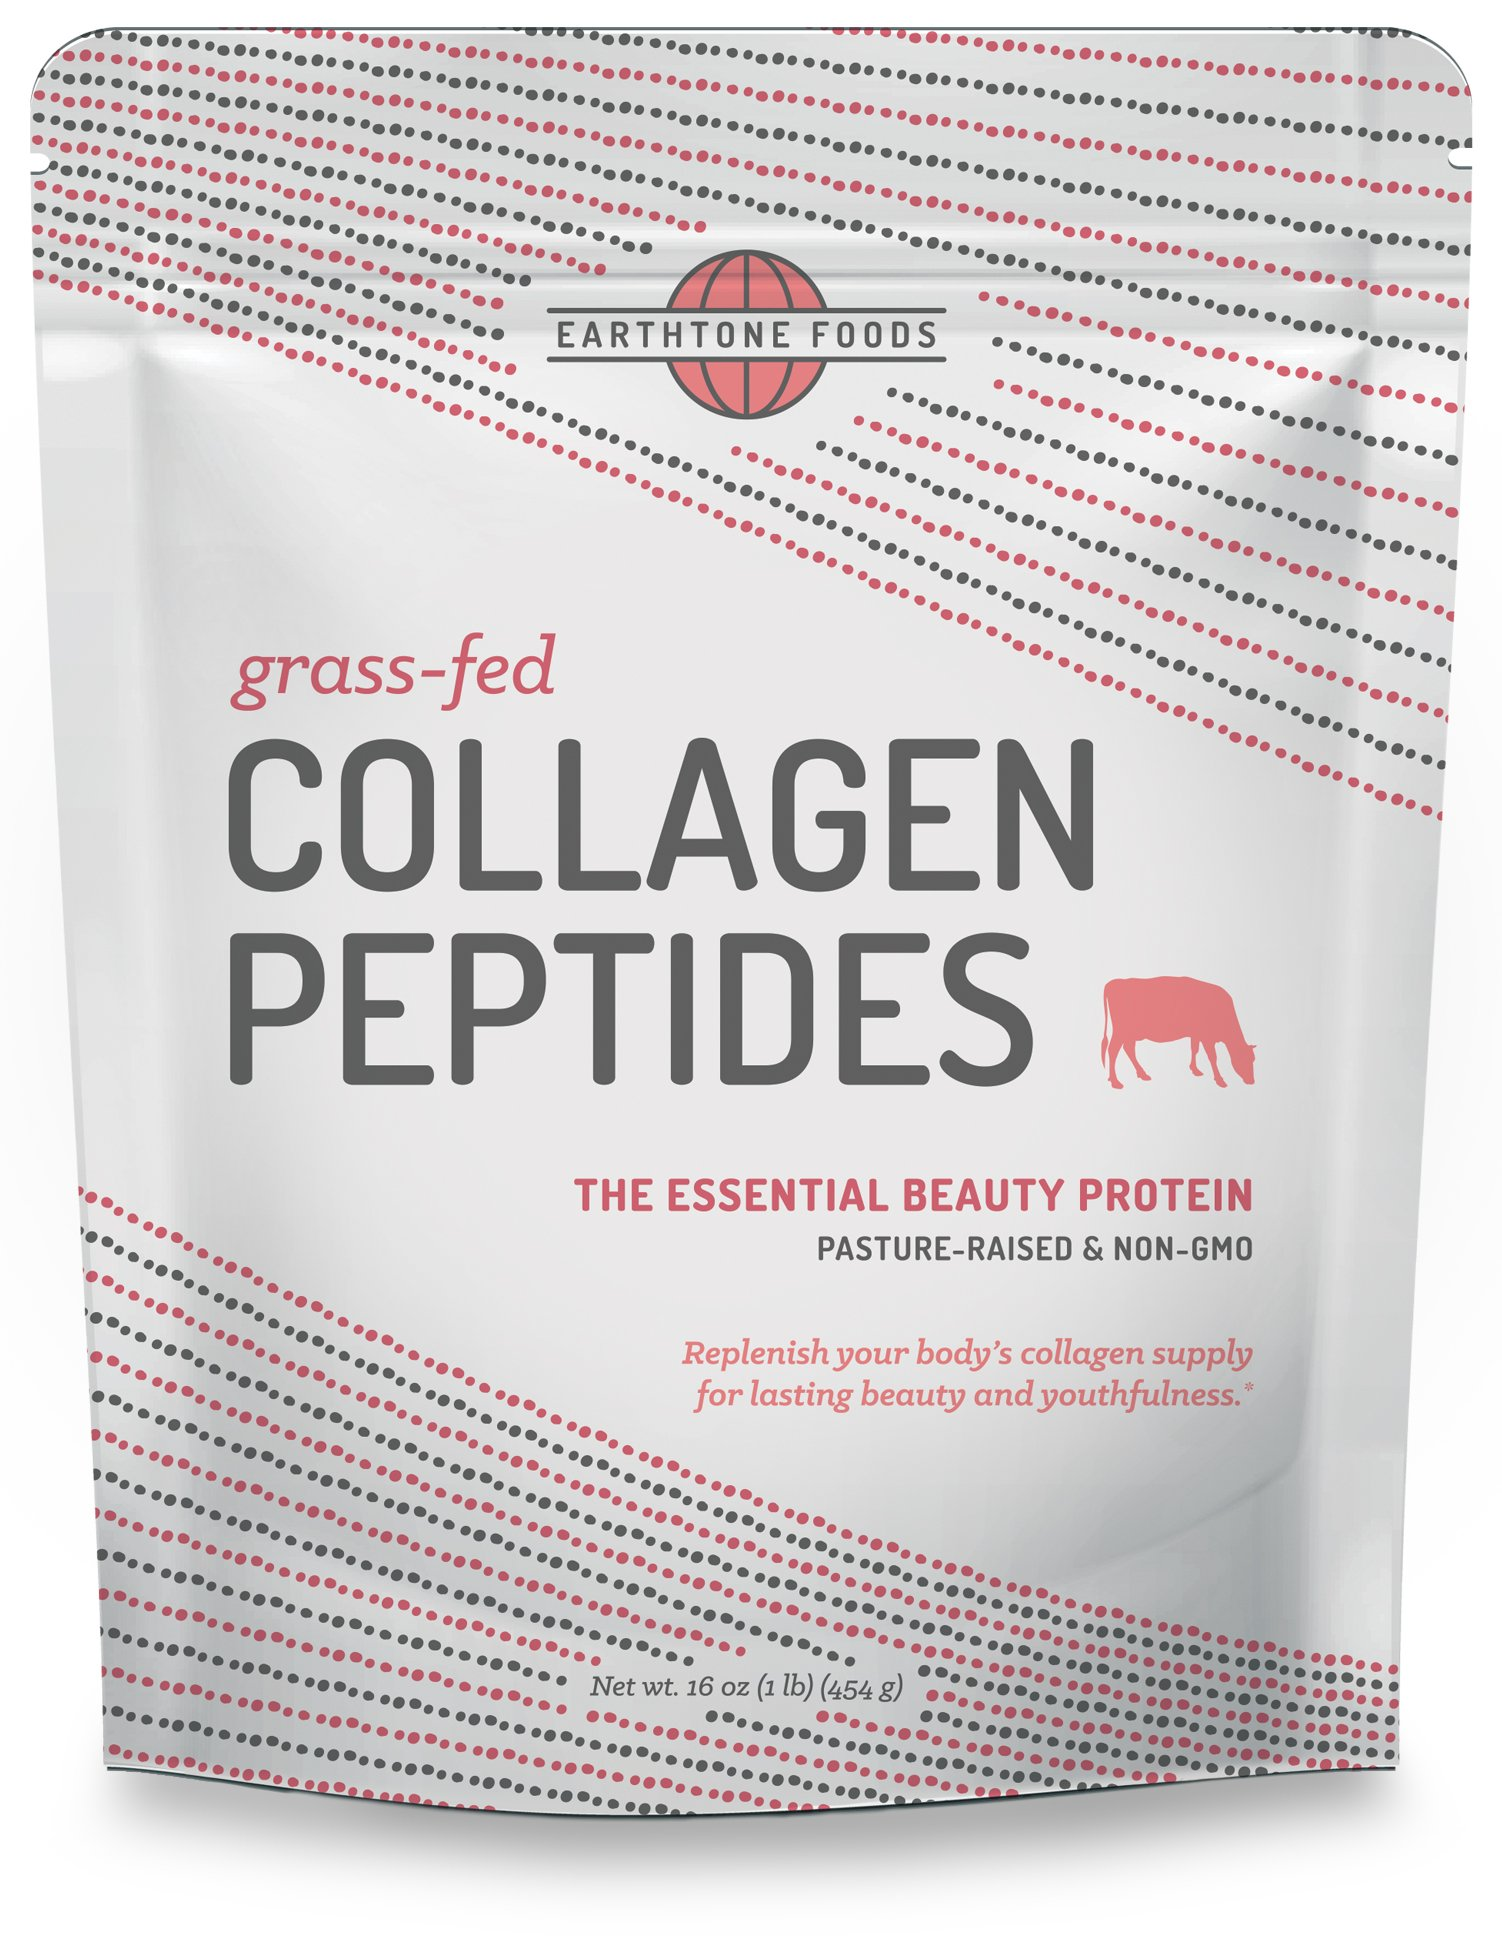 Collagen Peptides Powder (16 oz) | Paleo-Friendly Hydrolyzed Grass-Fed Non-GMO Protein